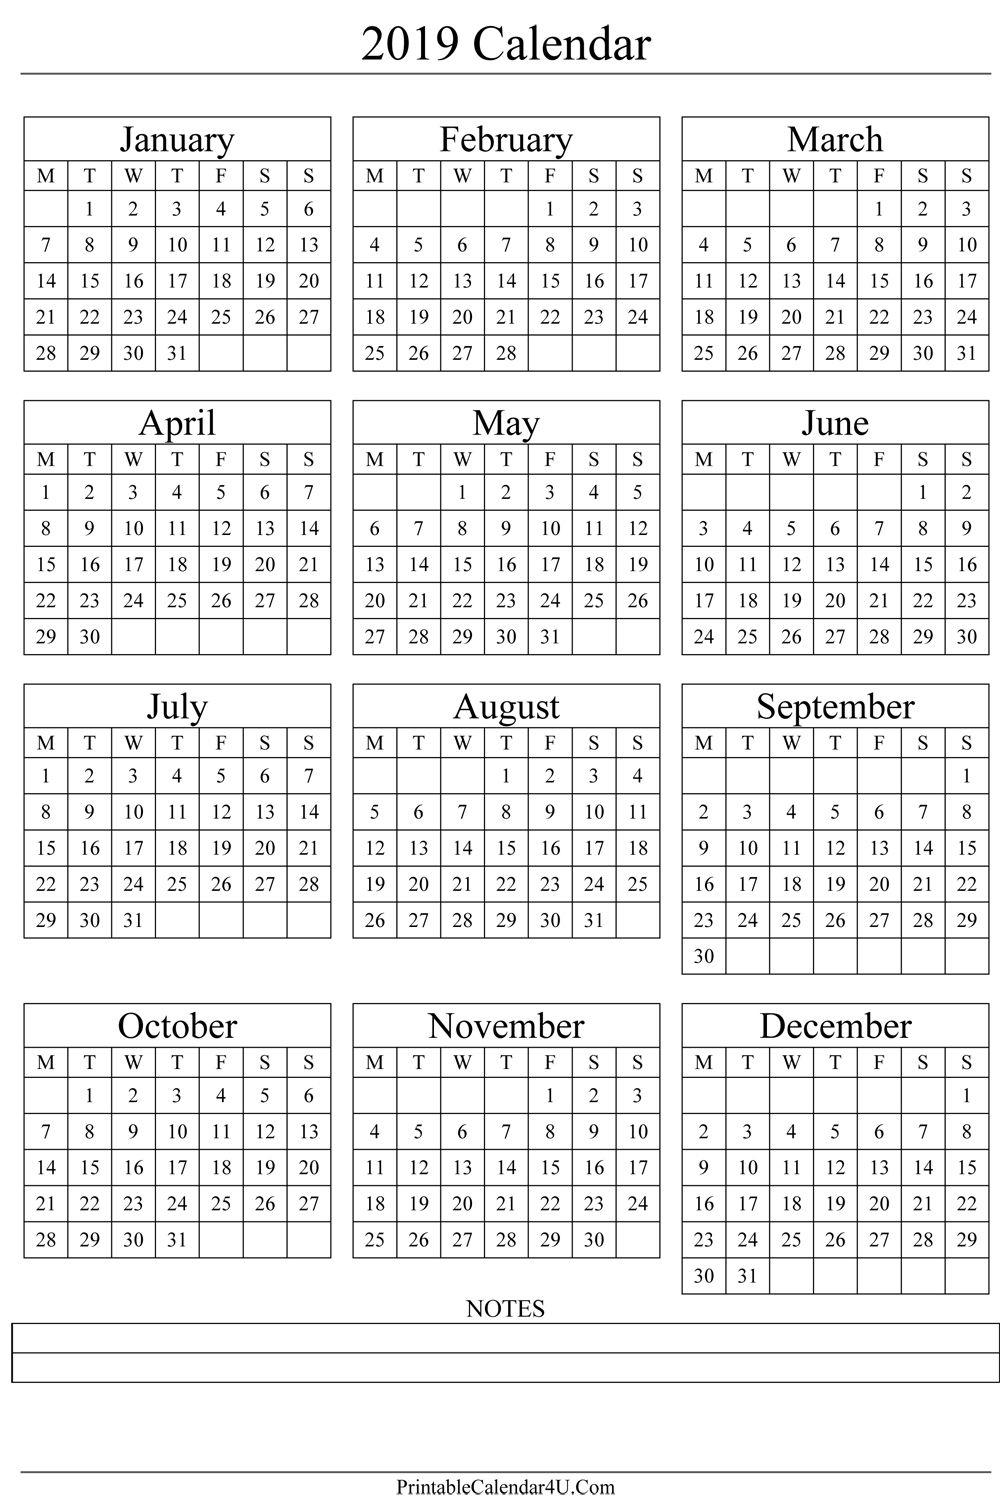 Yearly 2019 Printable Calendar